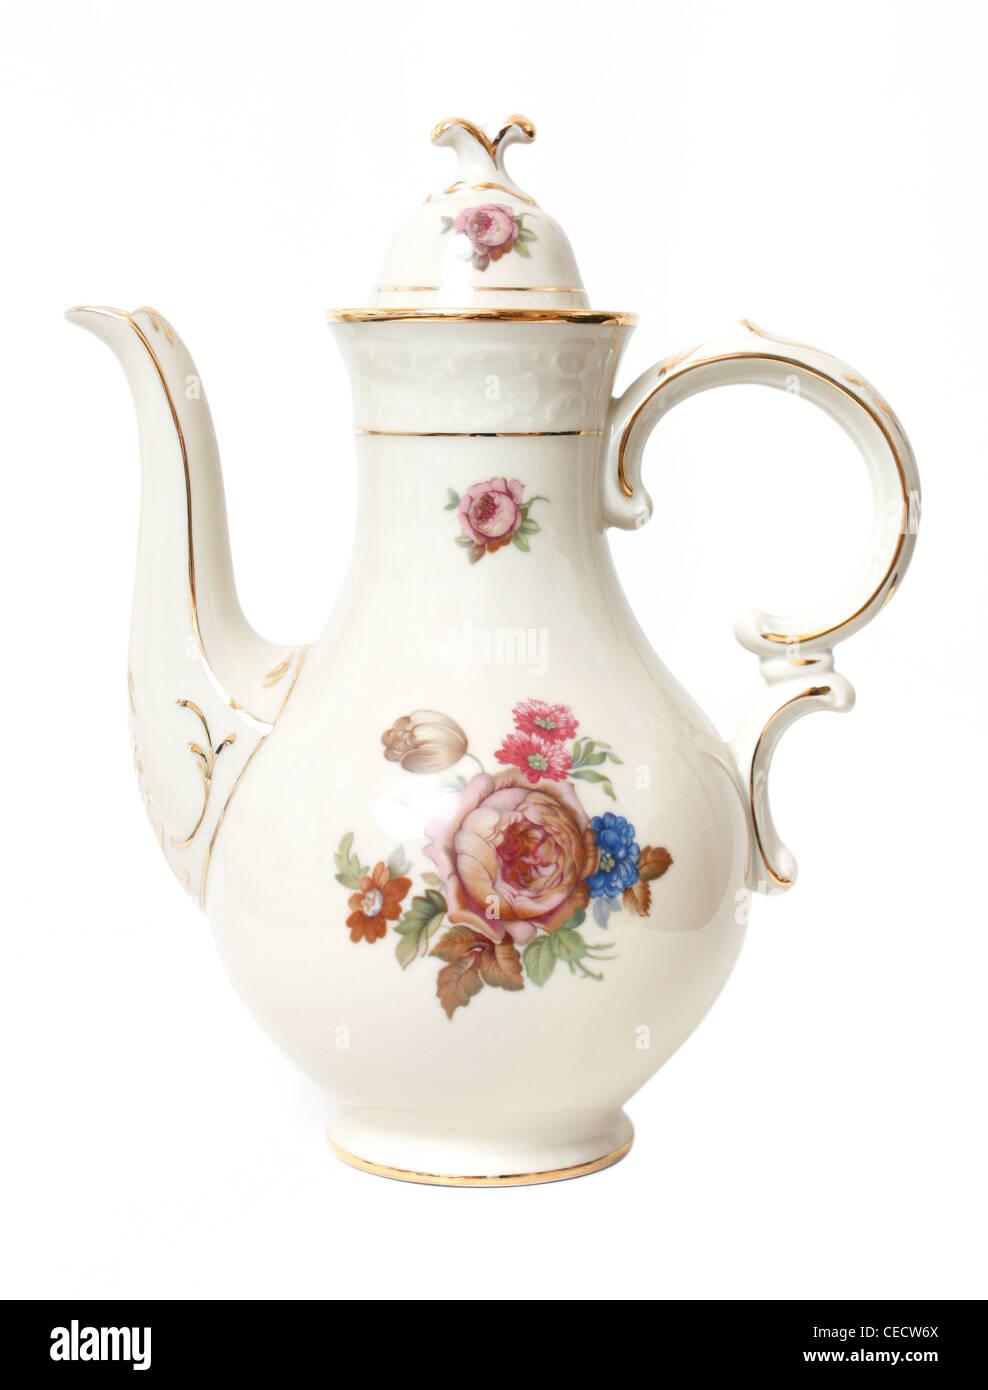 Decorative tea pot - Stock Image